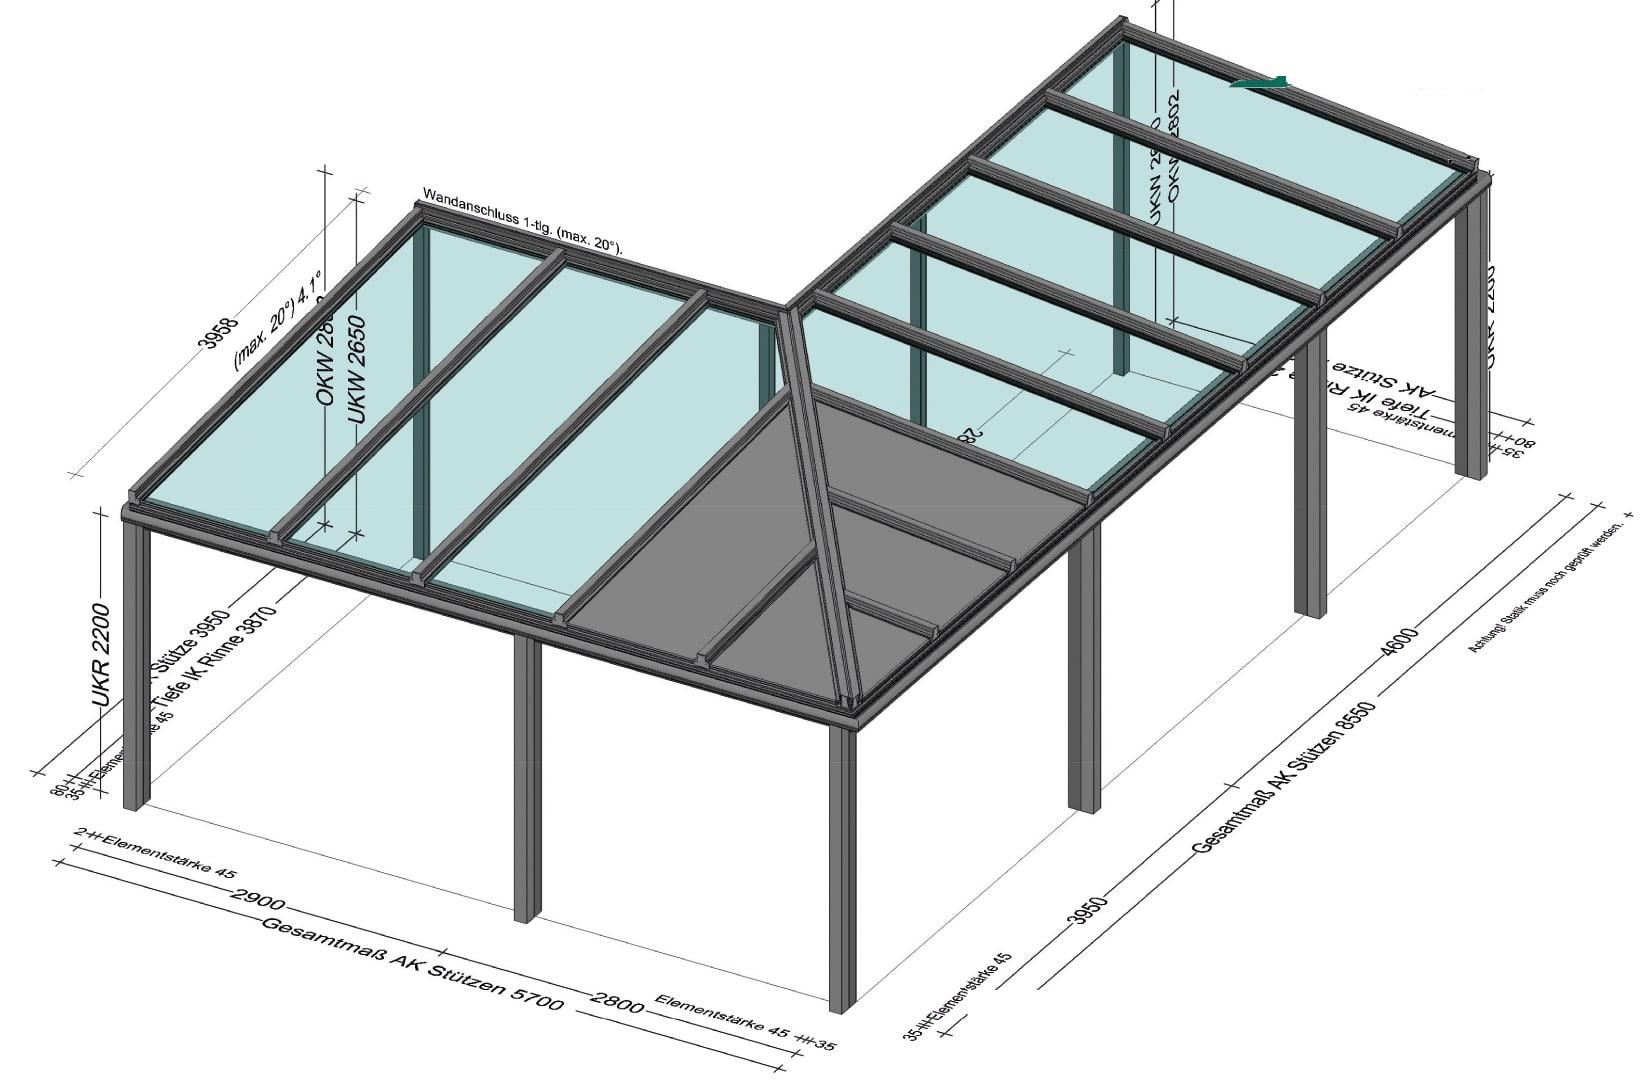 Terrassenüberdachung Eckkonstruktion in Alu